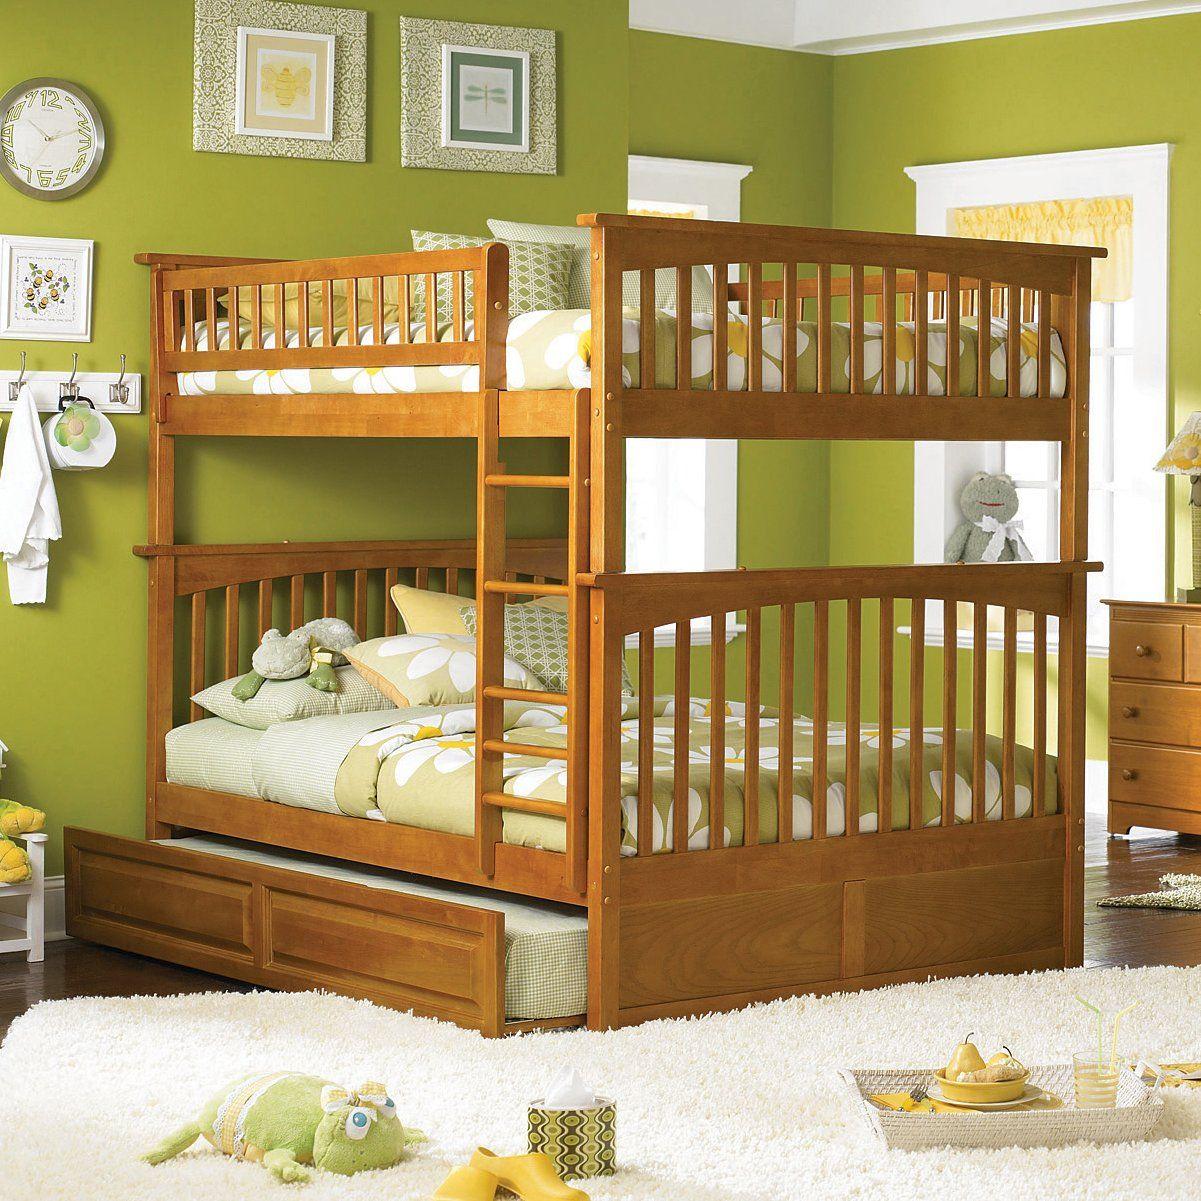 Tempat Tidur Dua Susun Harga Murah  Tempat tidur anak, Tempat